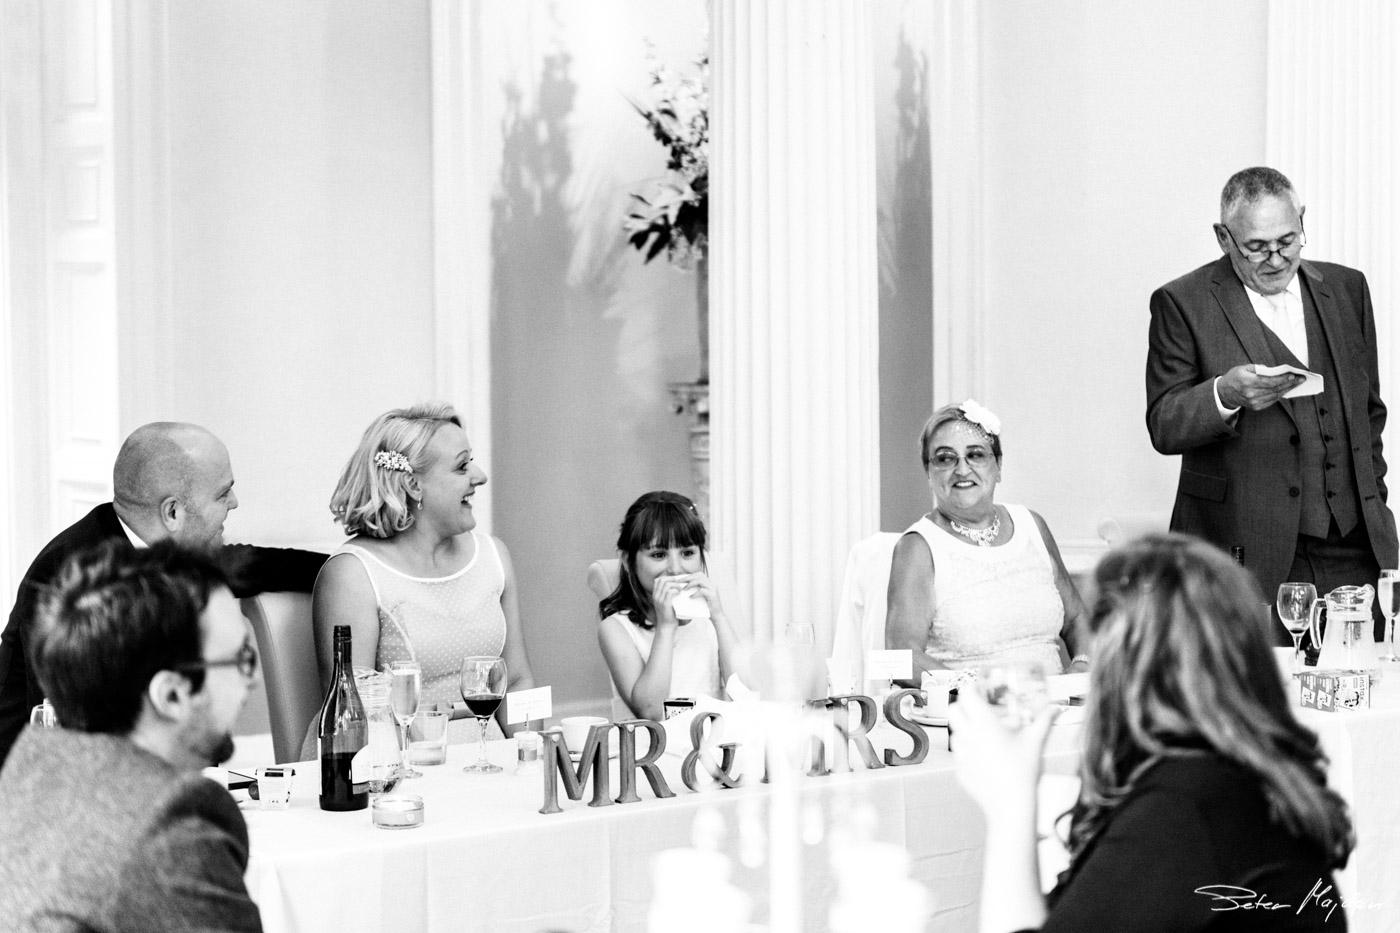 Colwick-hall-wedding-photography-49.jpg